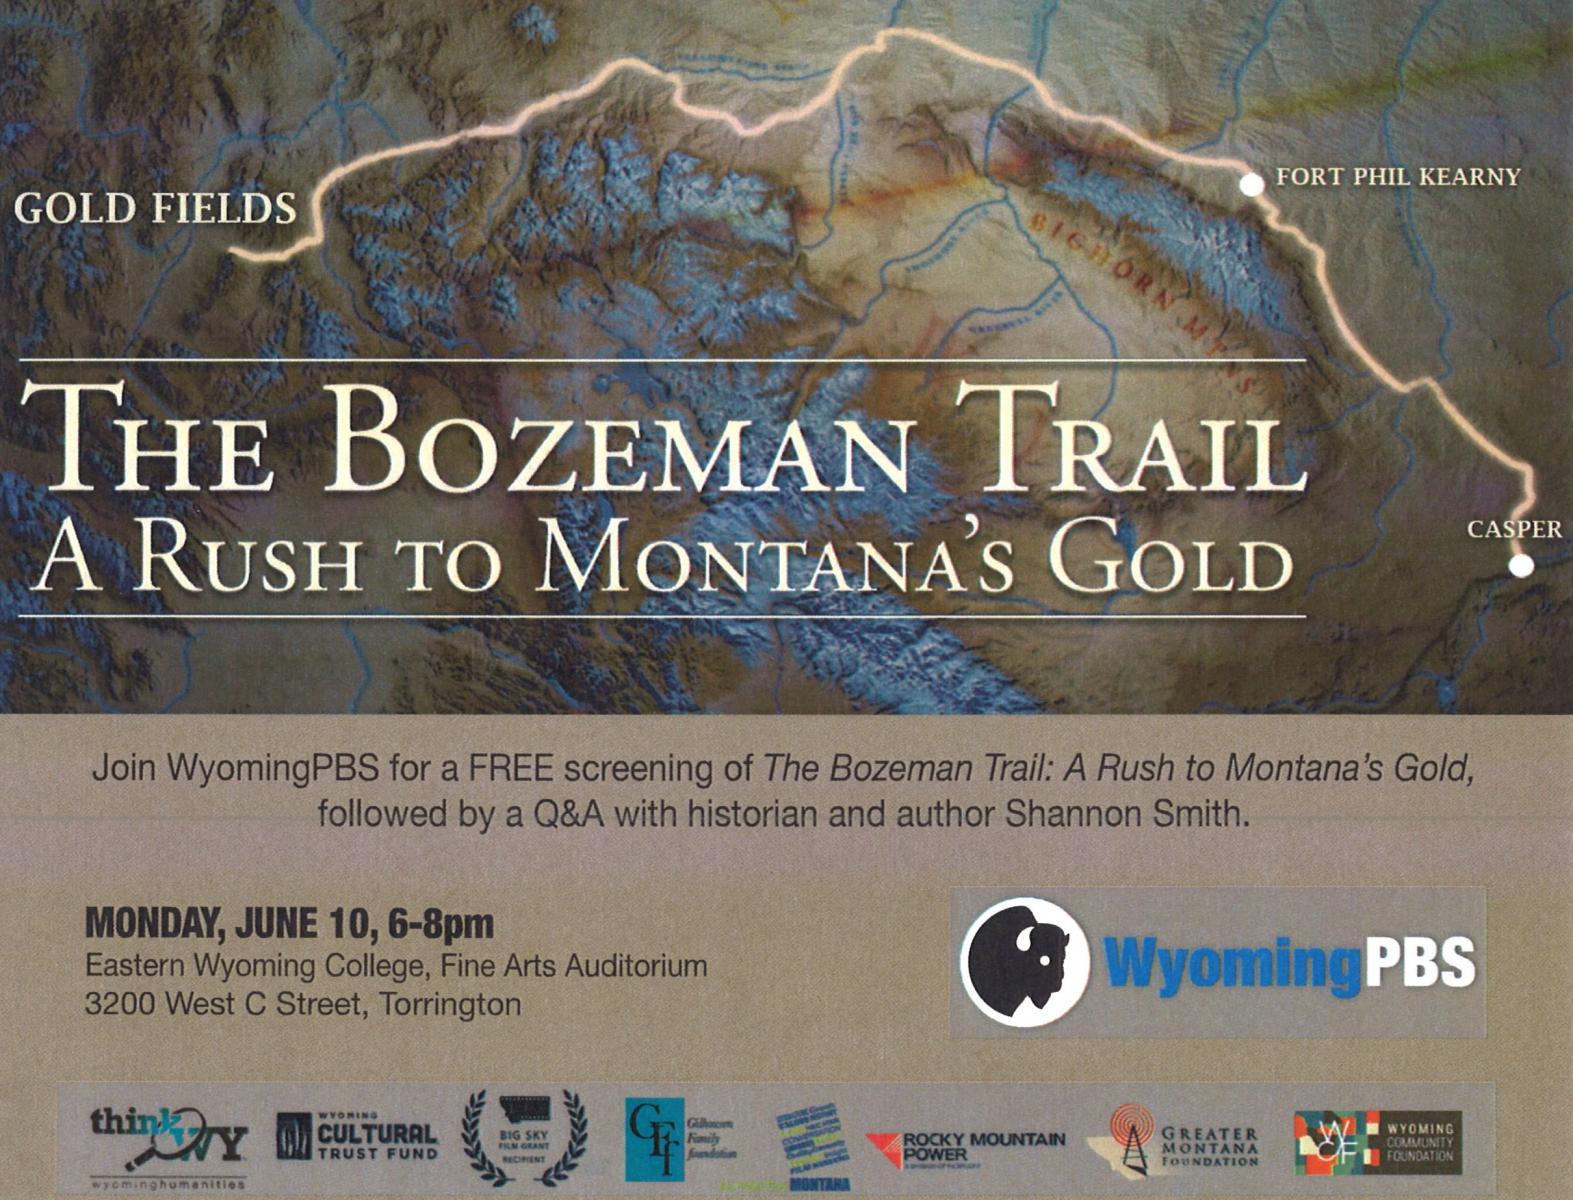 The Bozeman Trail: A Rush to Montana's Gold Photo